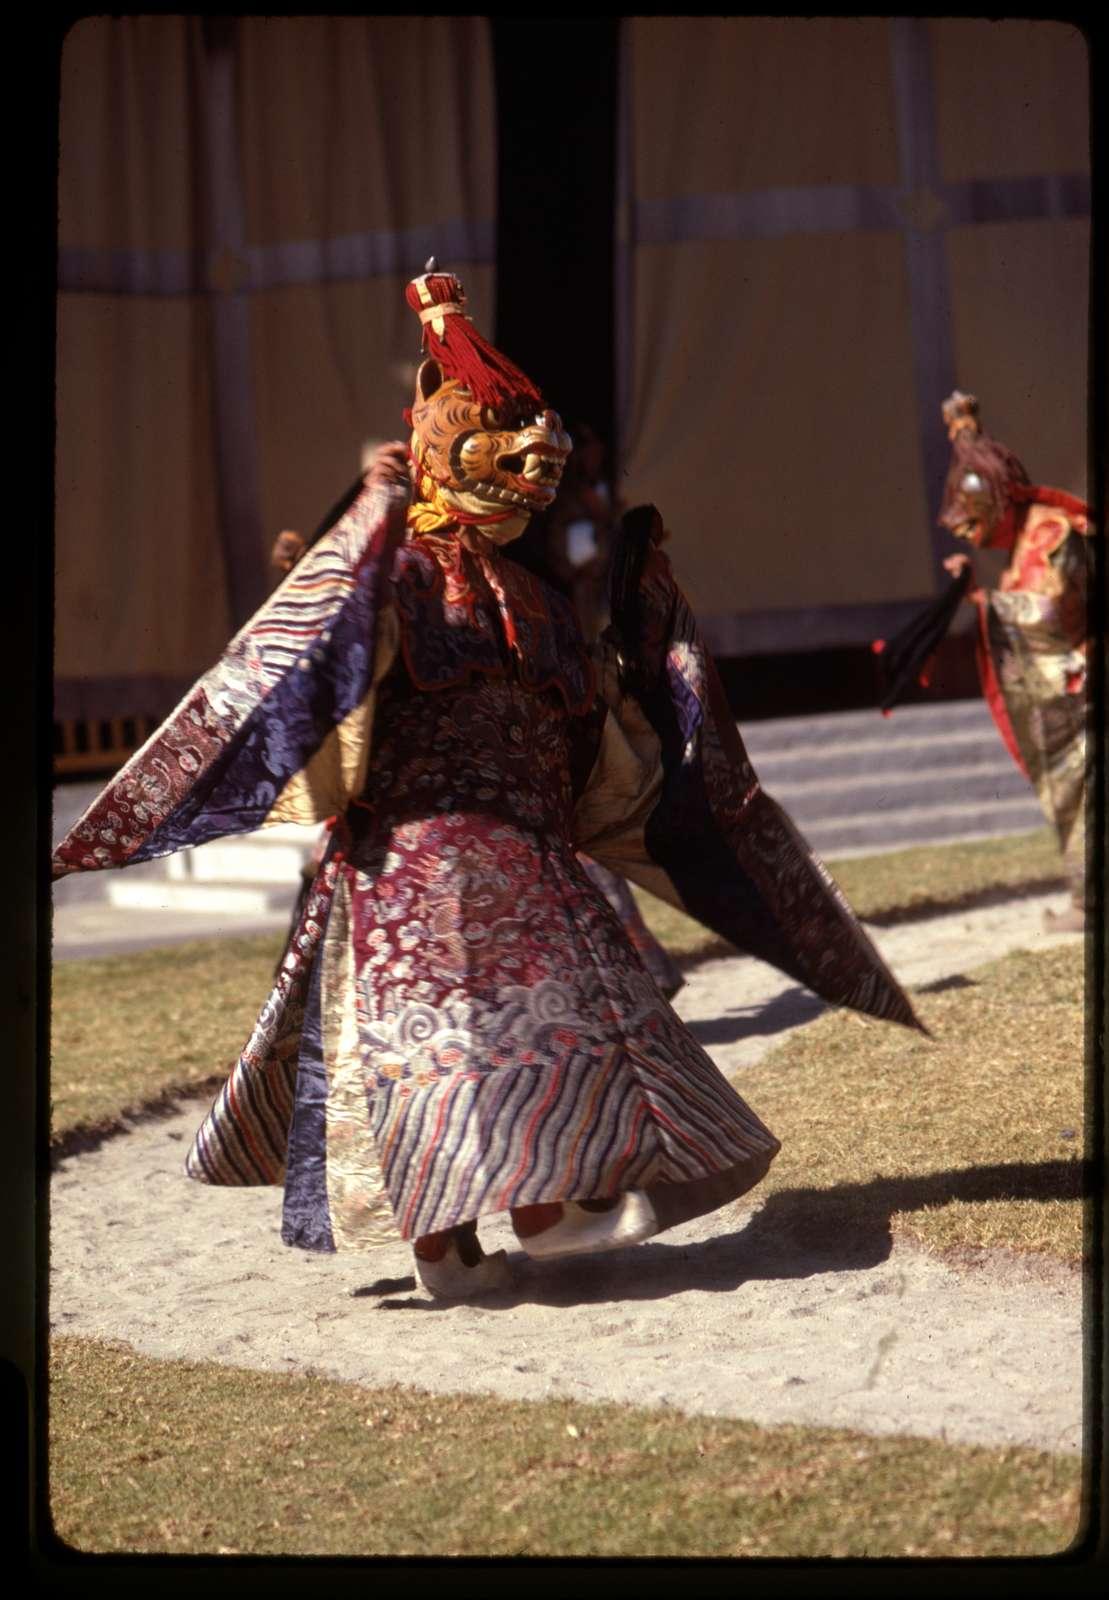 [Masked Black Hat dancer at New Year's ceremony, Gangtok, Sikkim]